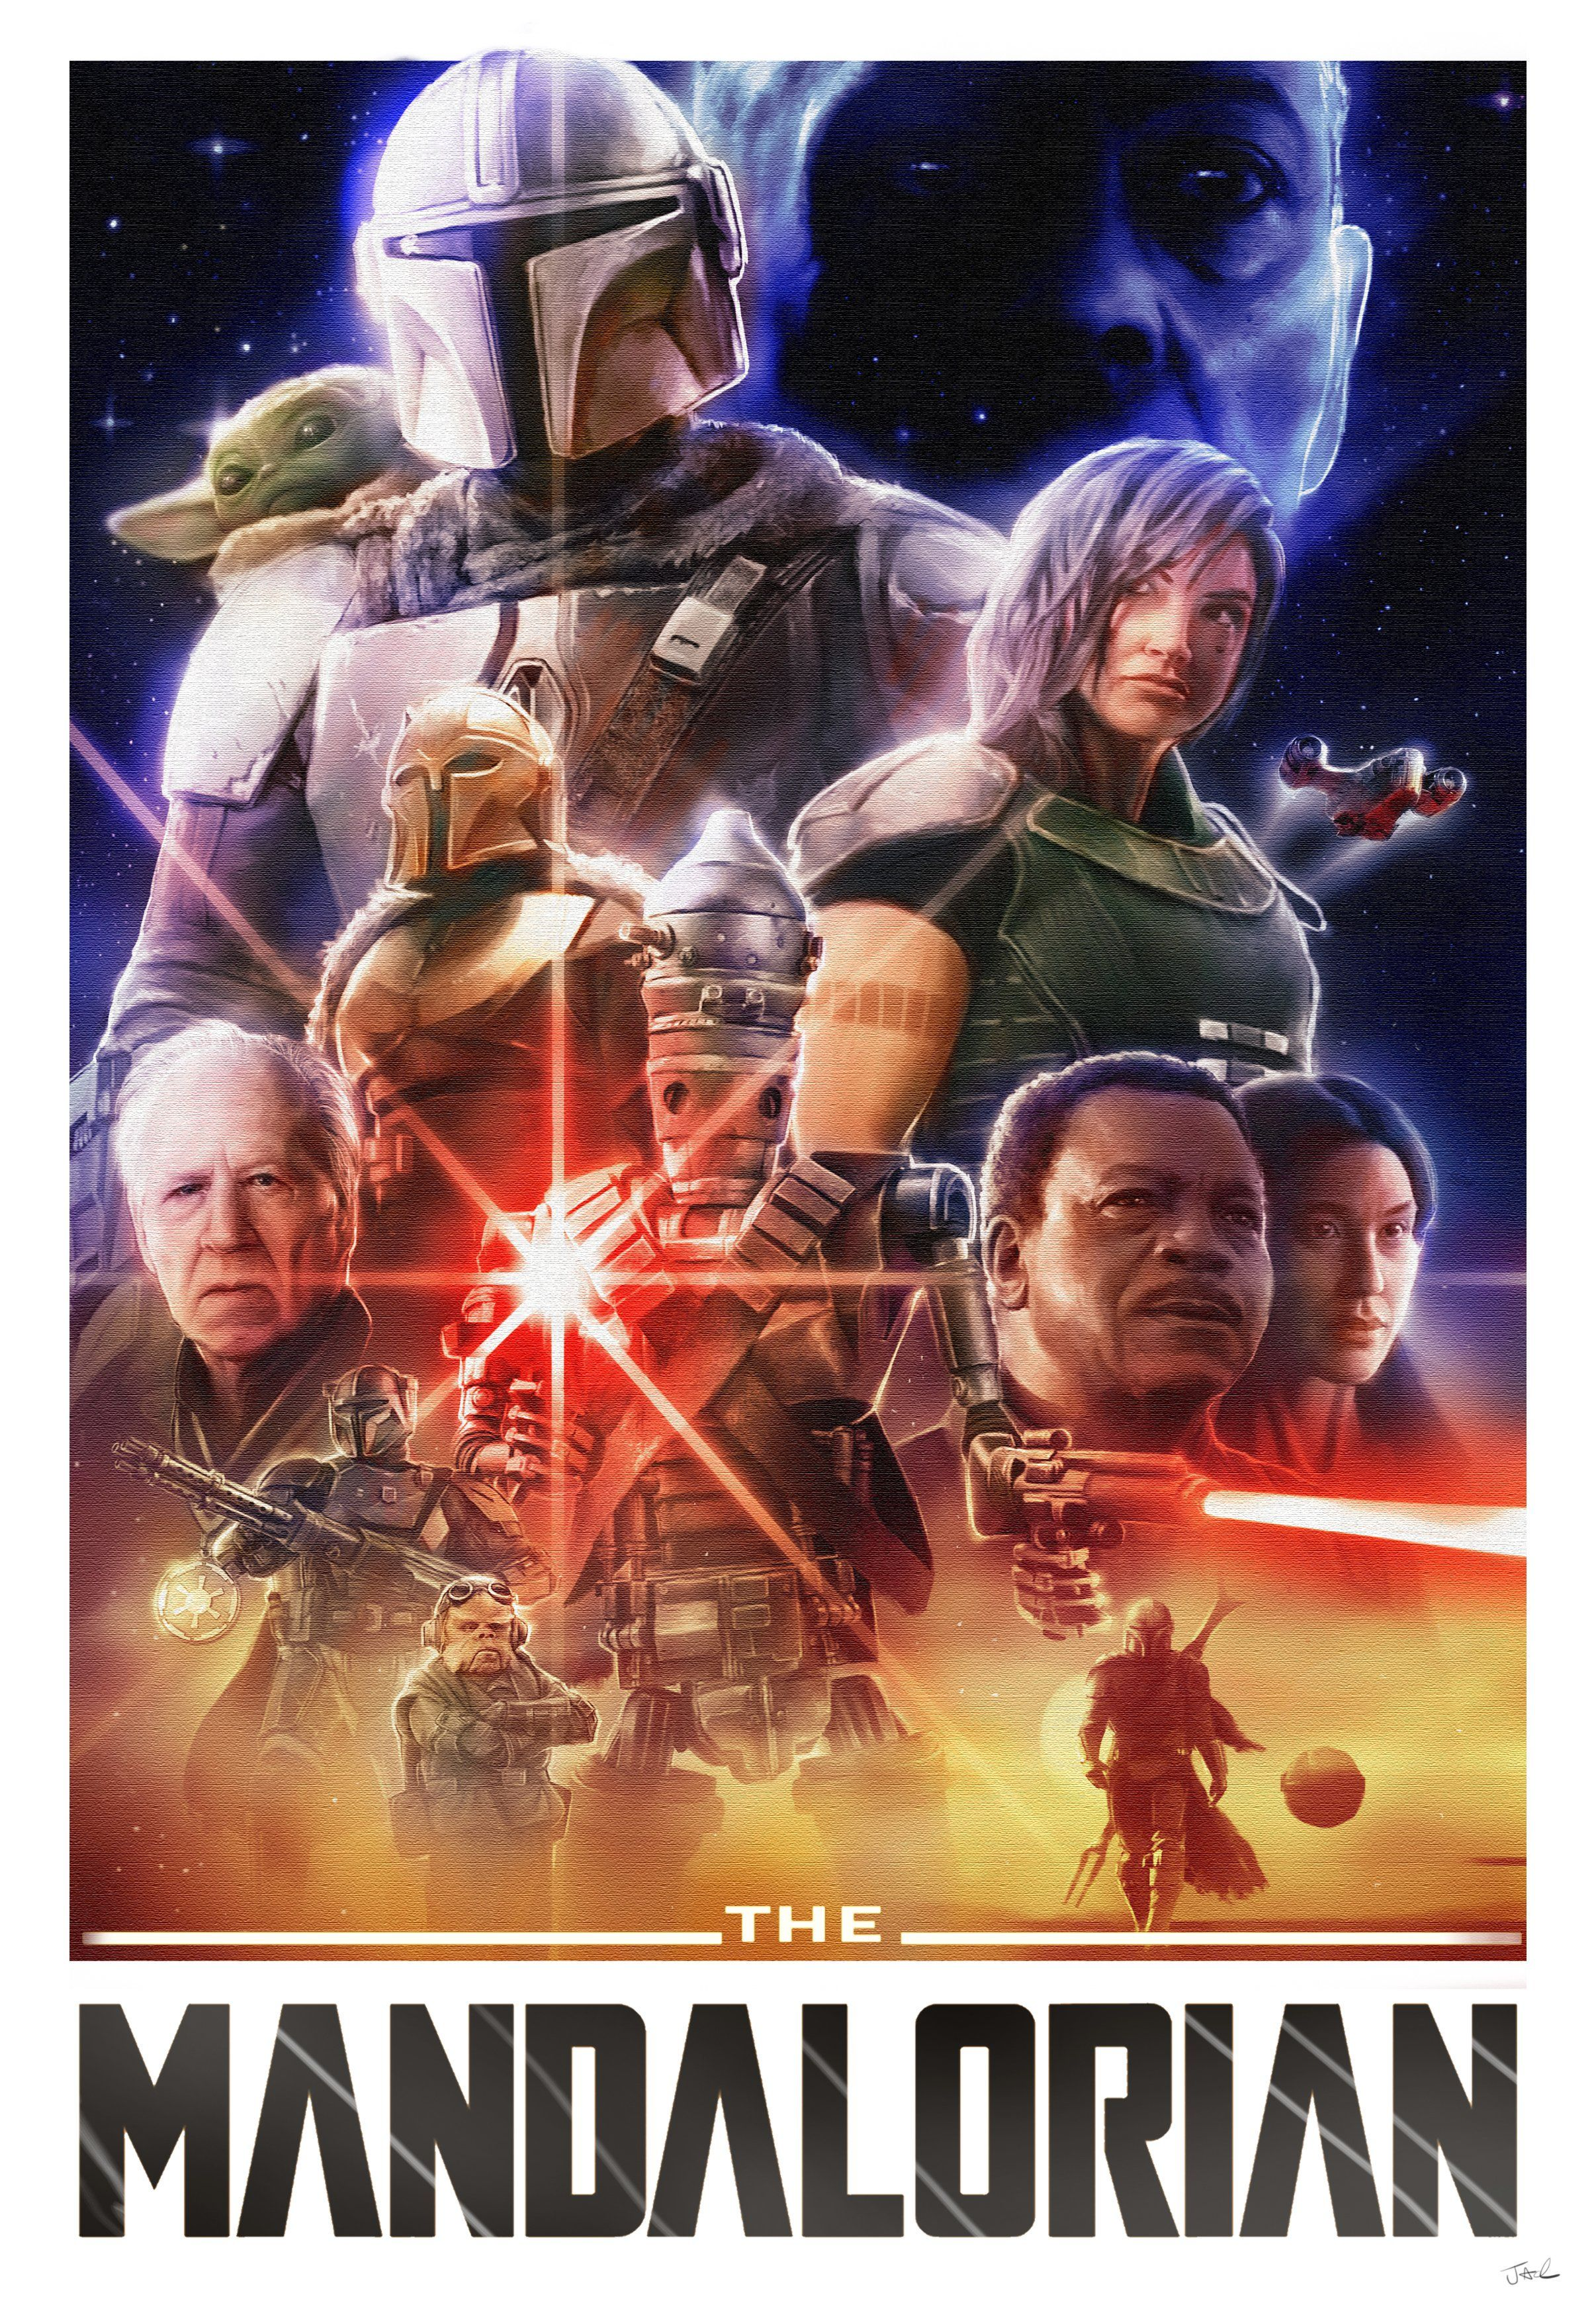 Drew this Mandalorian poster! Hope you like it!! )https